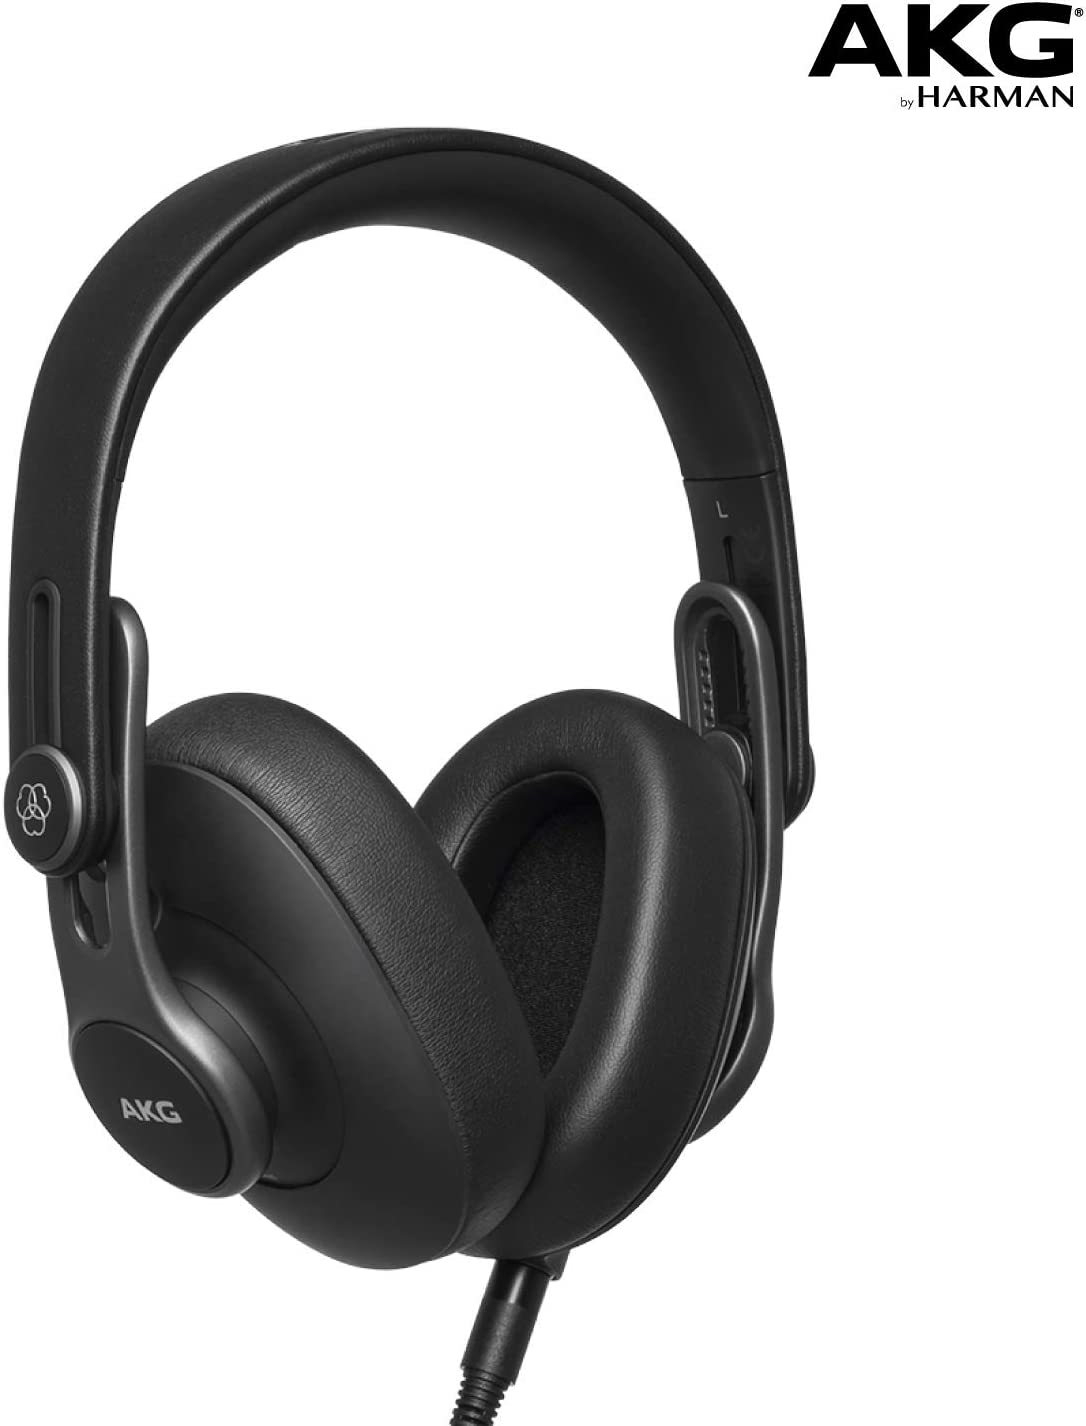 10 Best Studio Headphones Under 200 Dollars On Earth 8